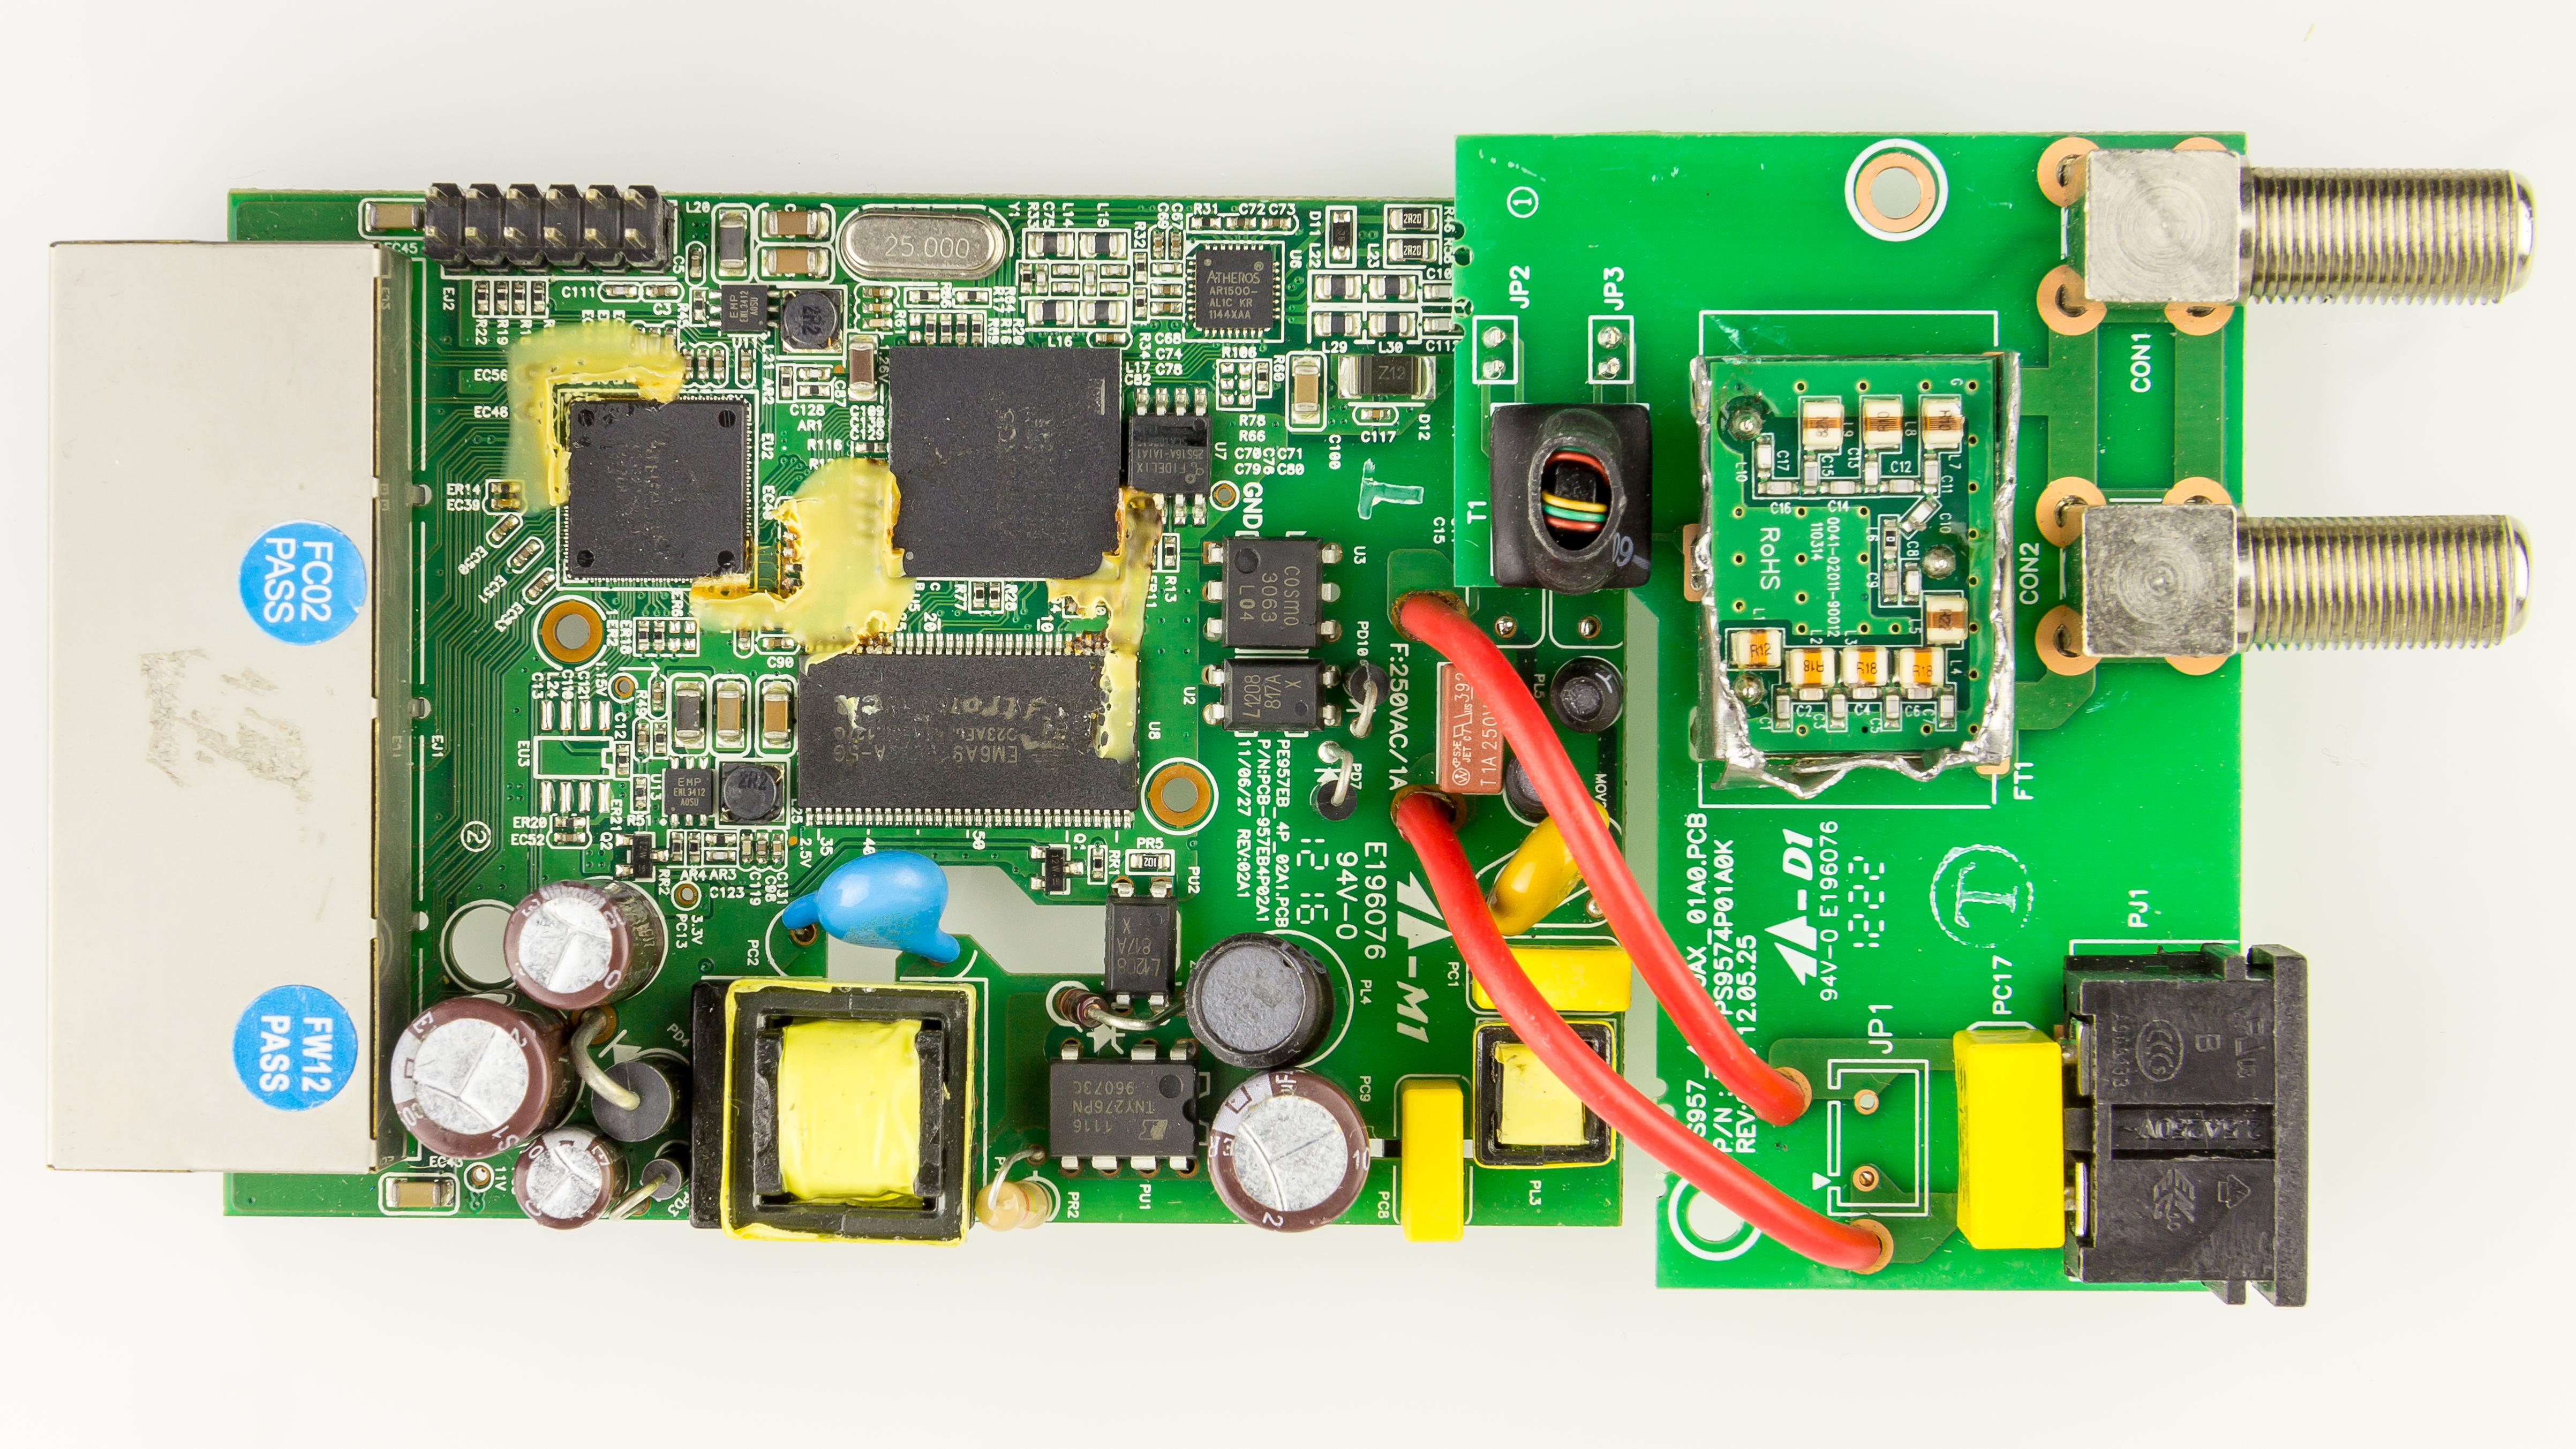 Filekraftcom Coaxline Adapter Cn Ke502m Printed Circuit Board Pcb 13 Royalty Free Stock Photos Image 8823